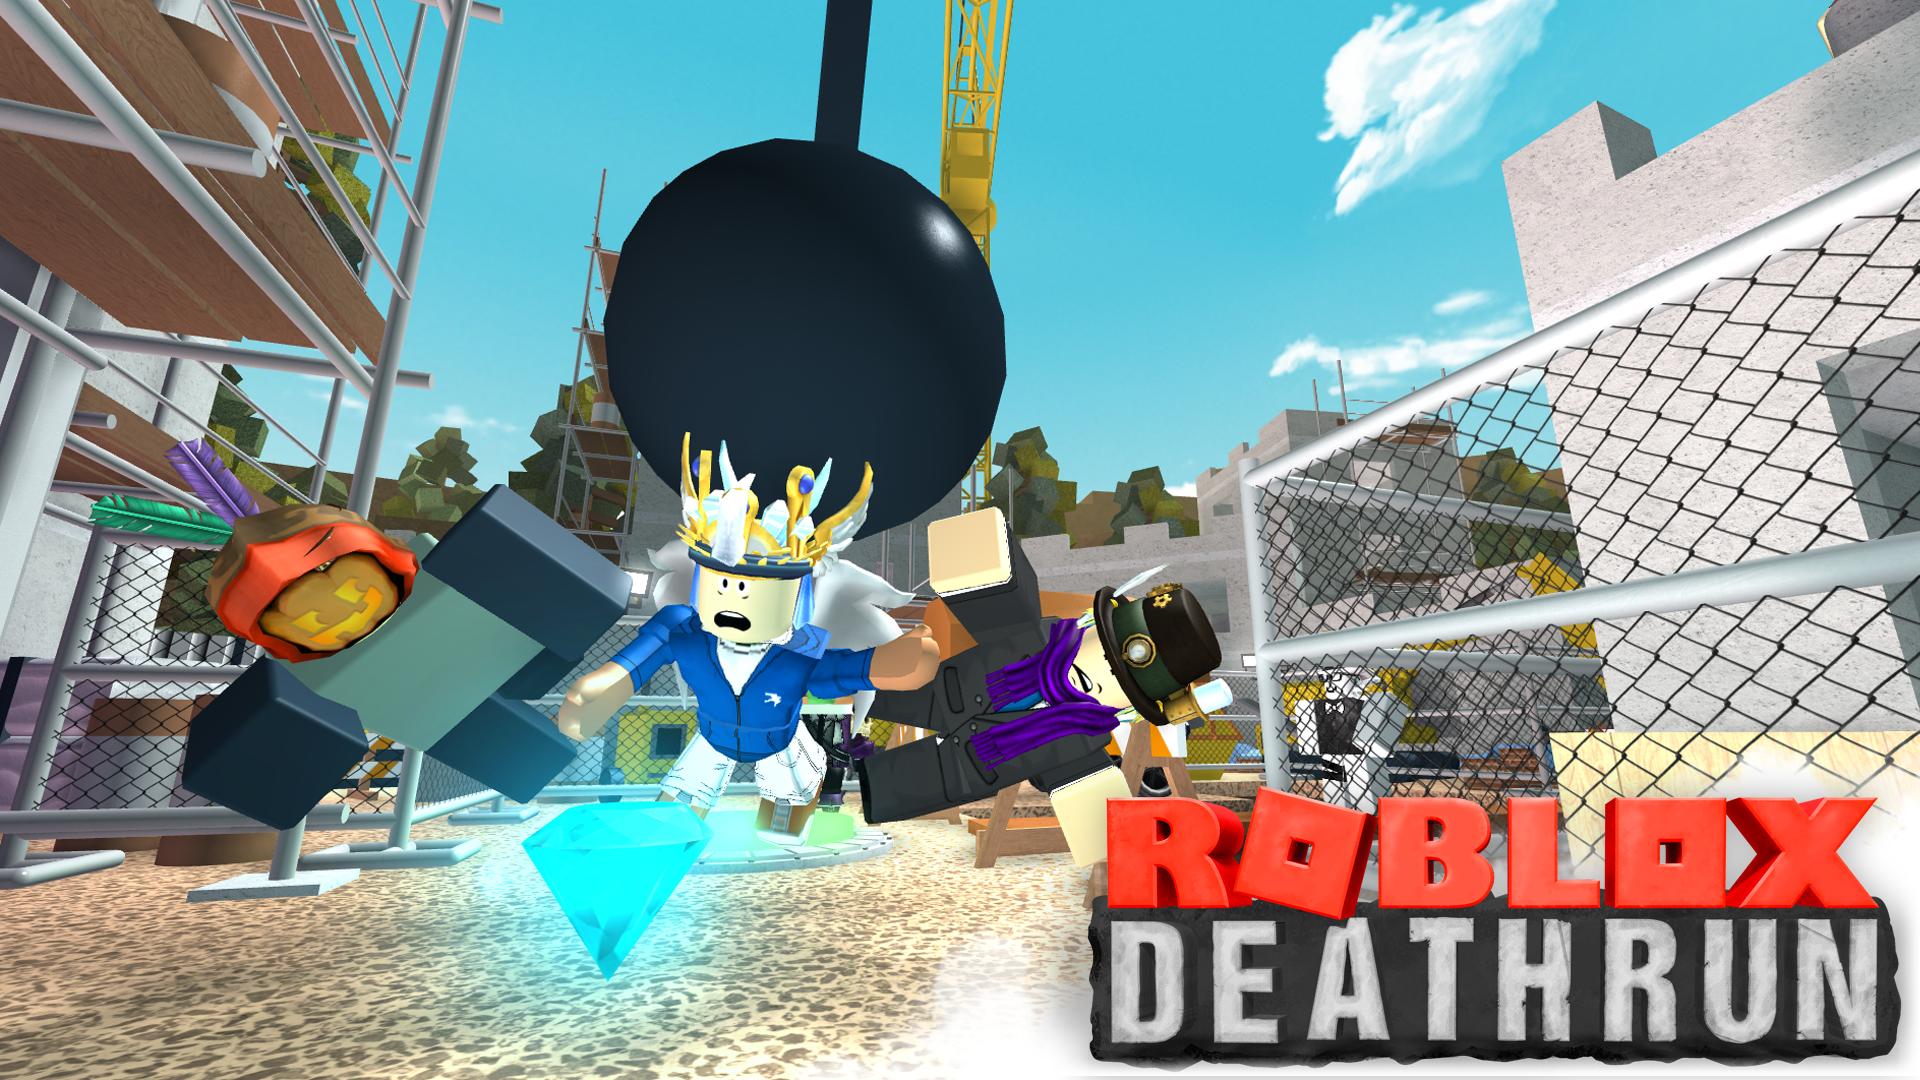 Code For Roblox Slender Man Revenge Camera Team Deathrun Deathrun Roblox Wikia Fandom